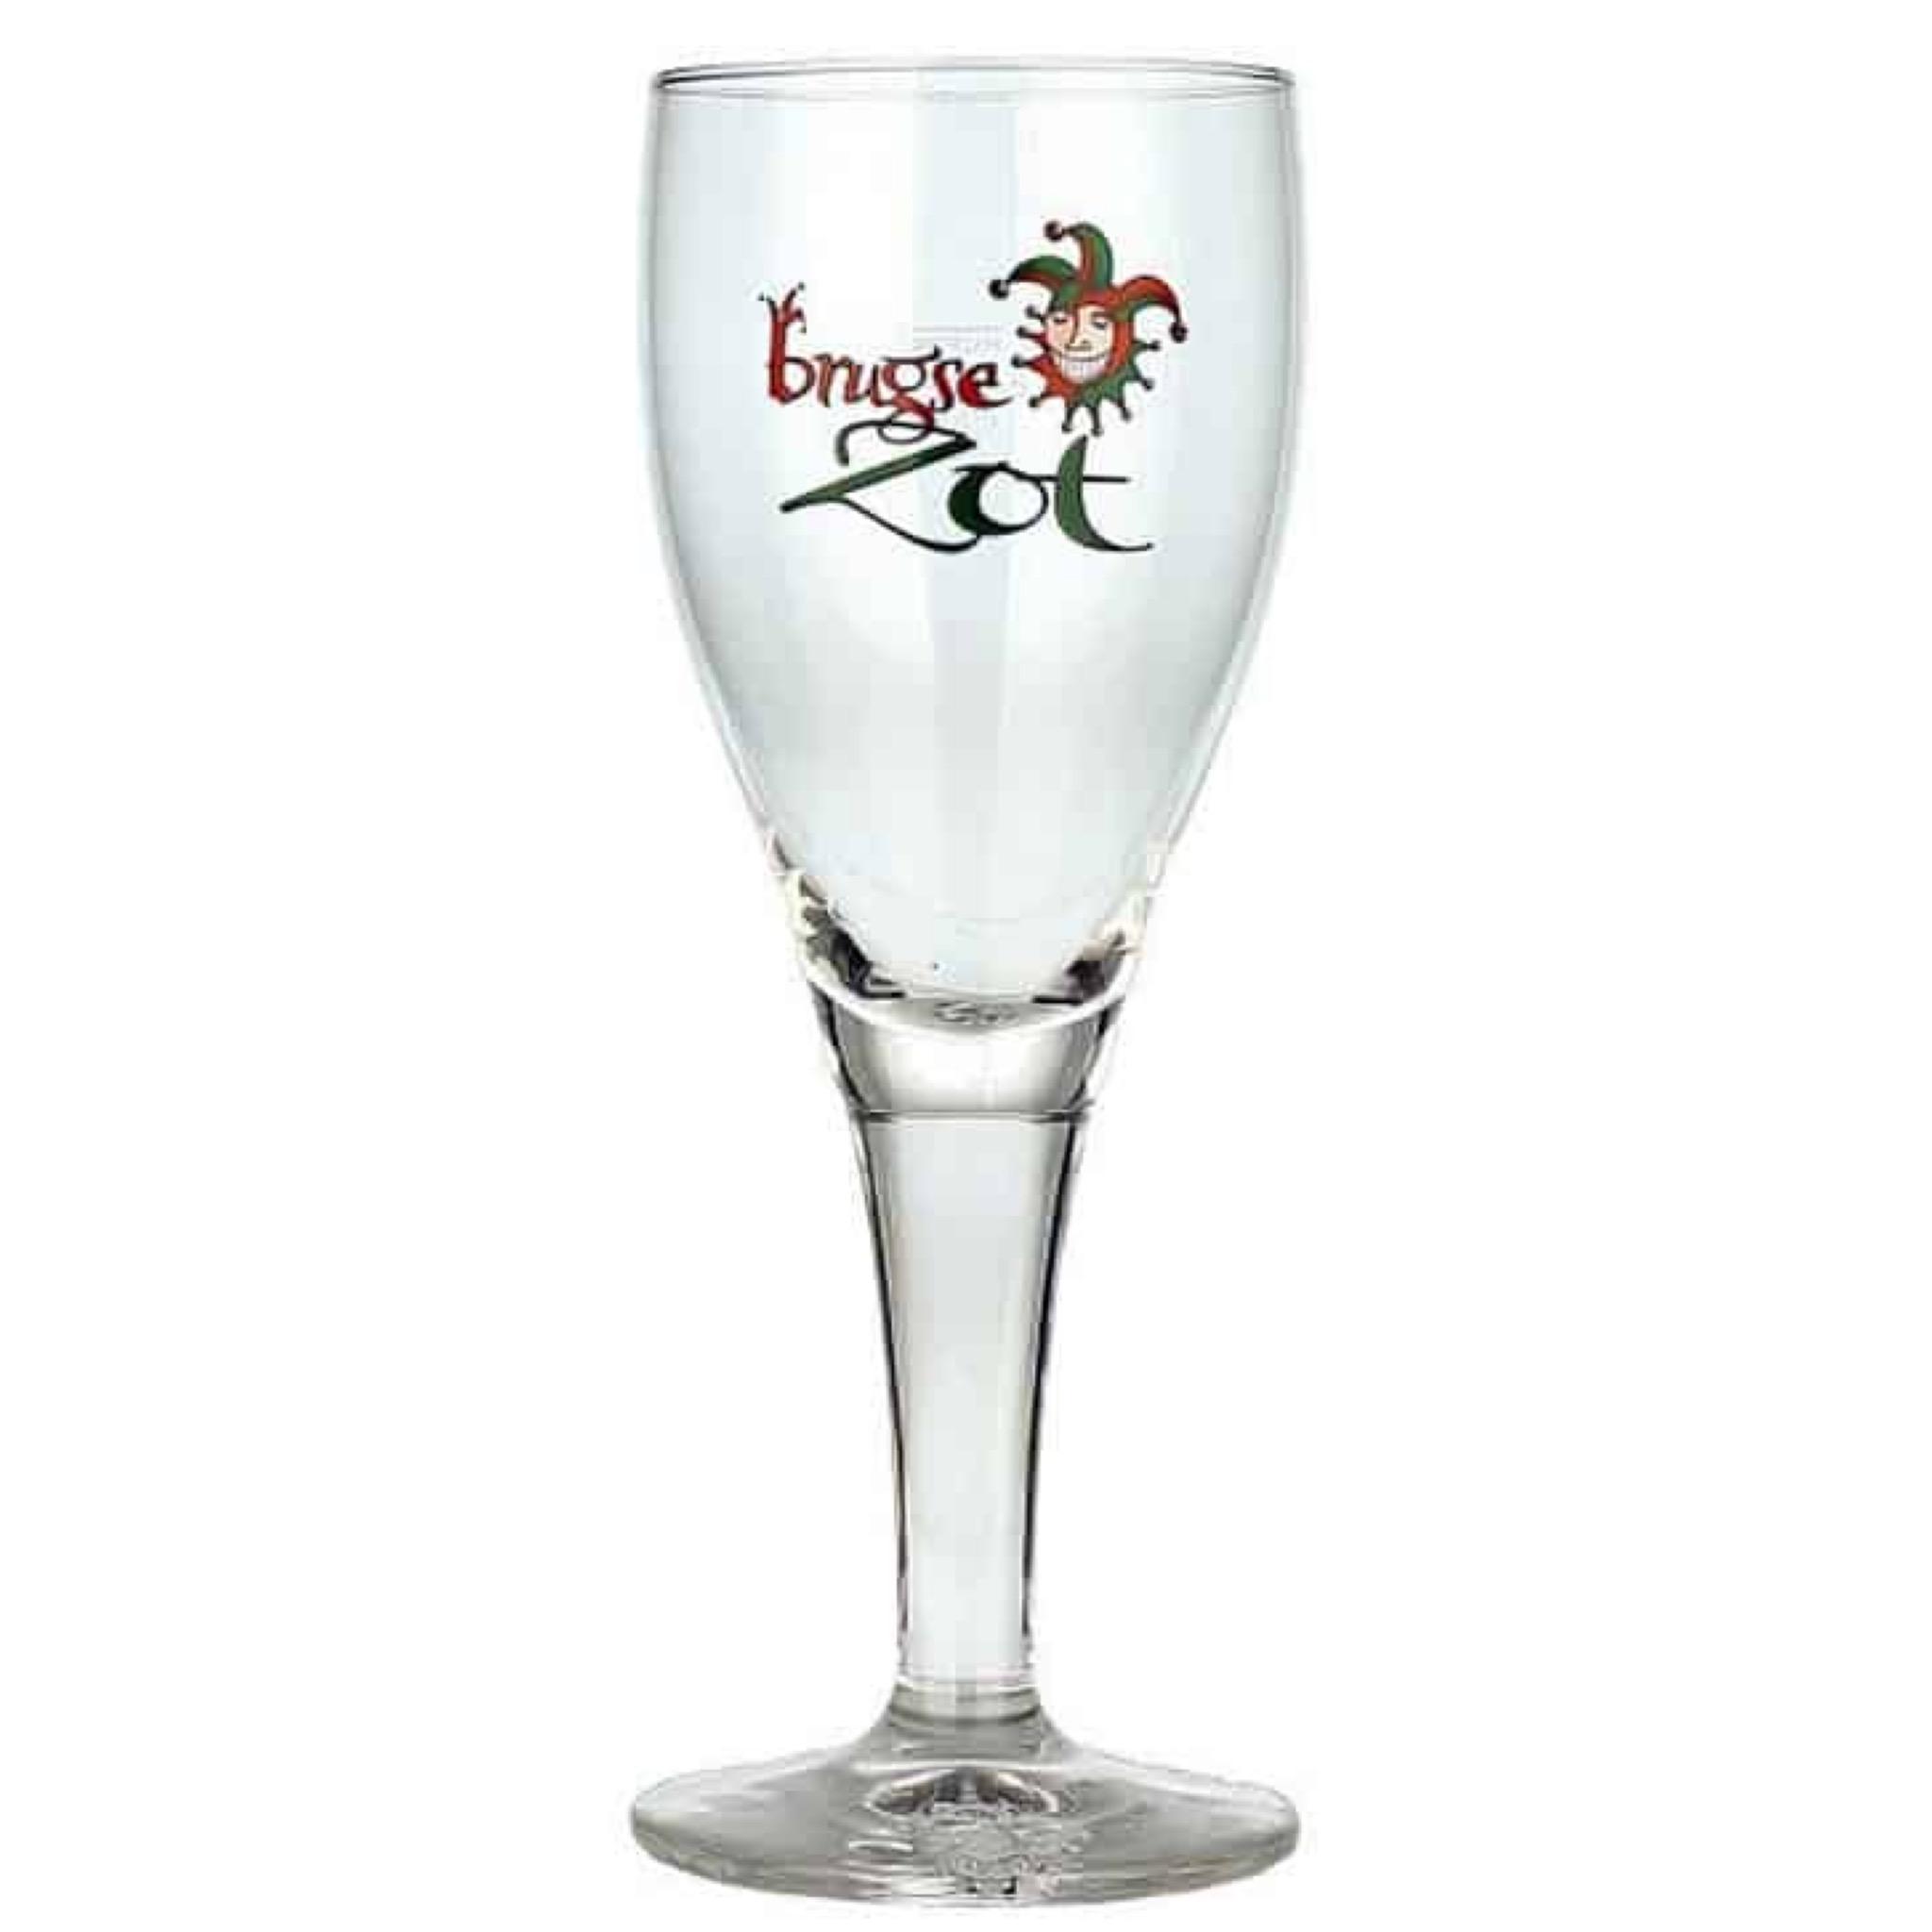 Brugse Zot Beer Glass 330ml